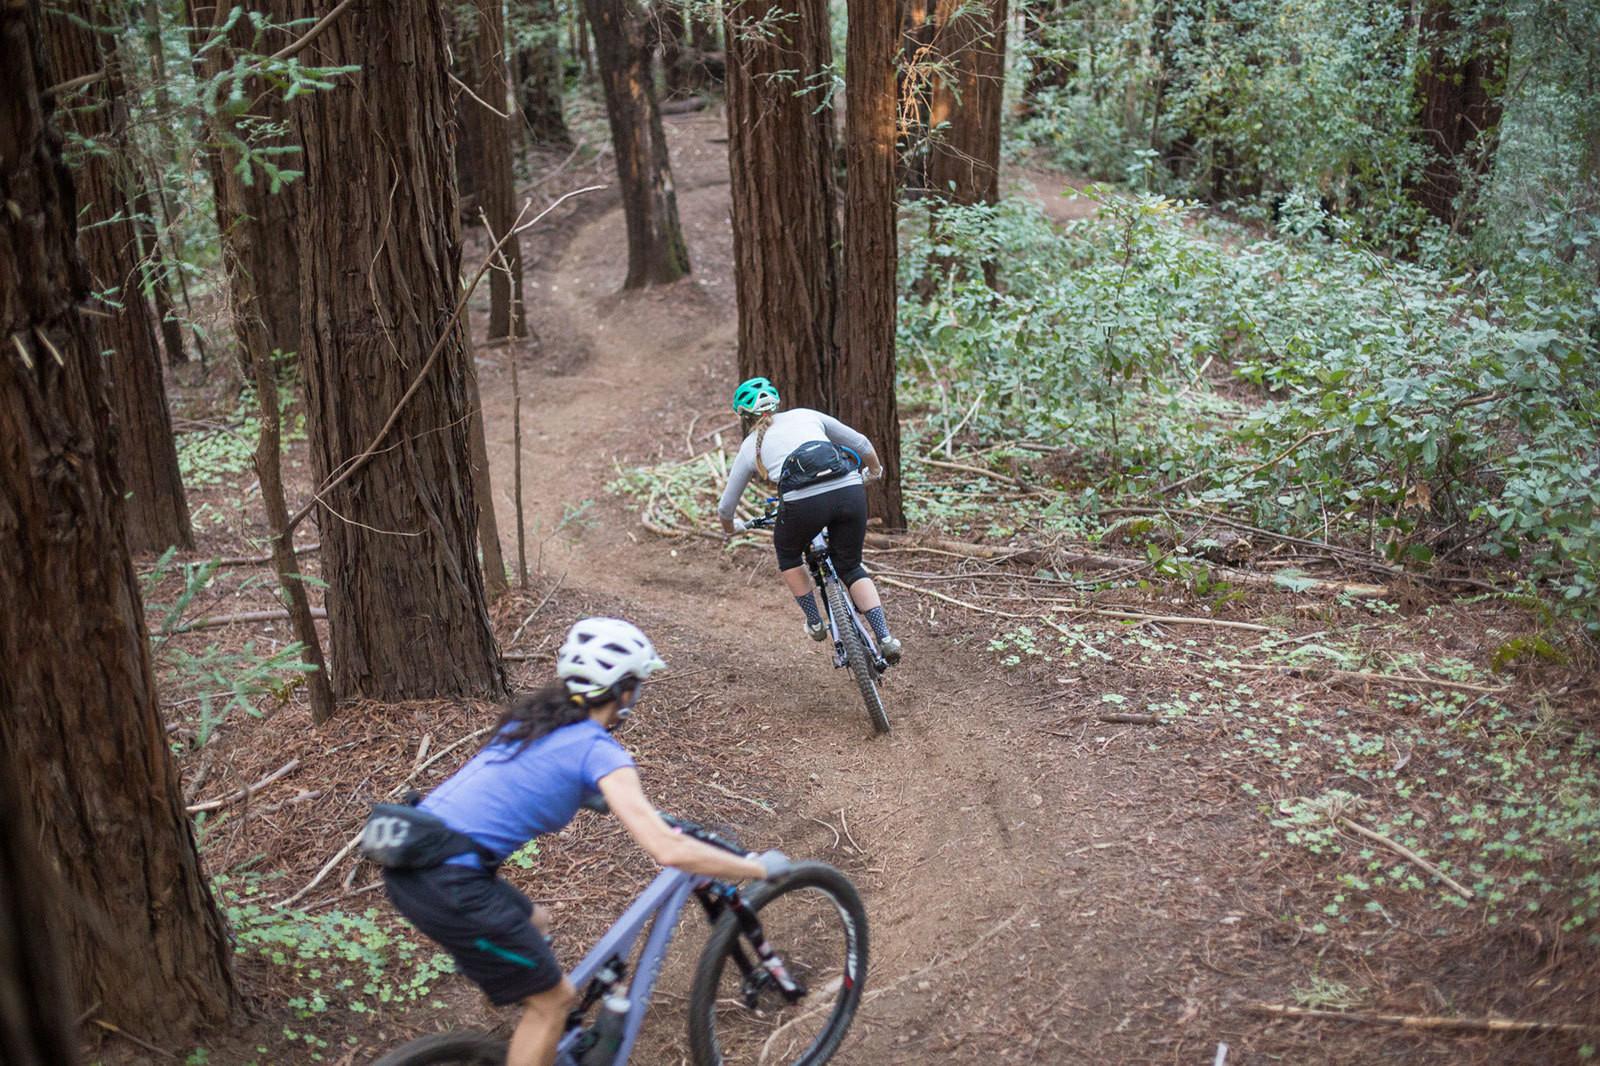 Juliana-SRAM pro team riders Kelli Emmett and Sarah Leishman on the Emma McCrary Trail in Santa Cruz, CA. Photo: Mike Thomas/SCB